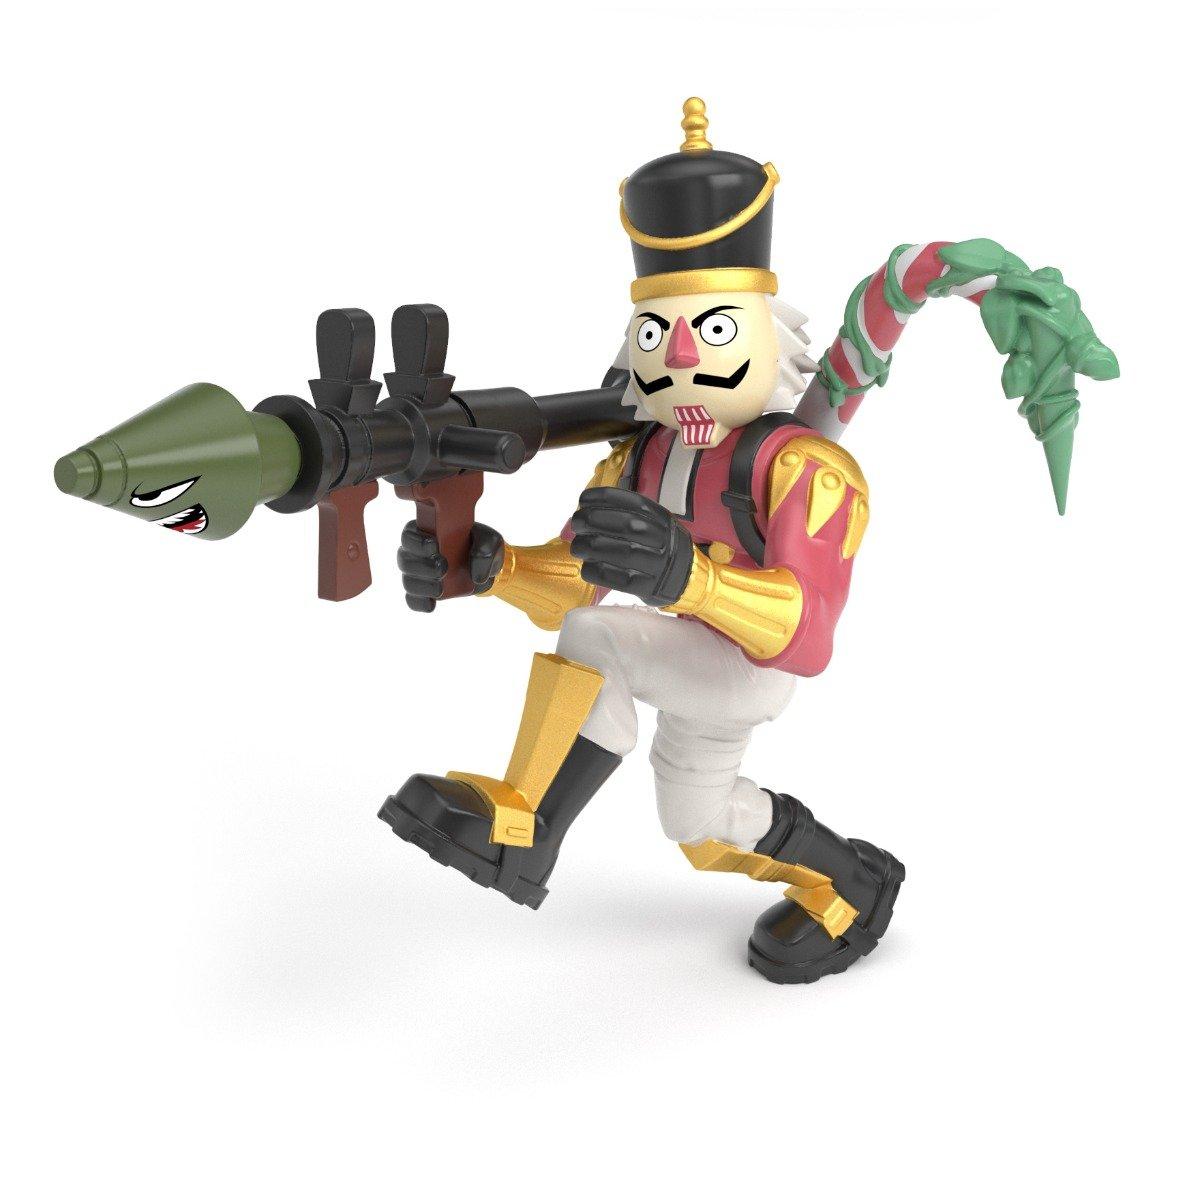 Figurina Fortnite S2 - Crackshot